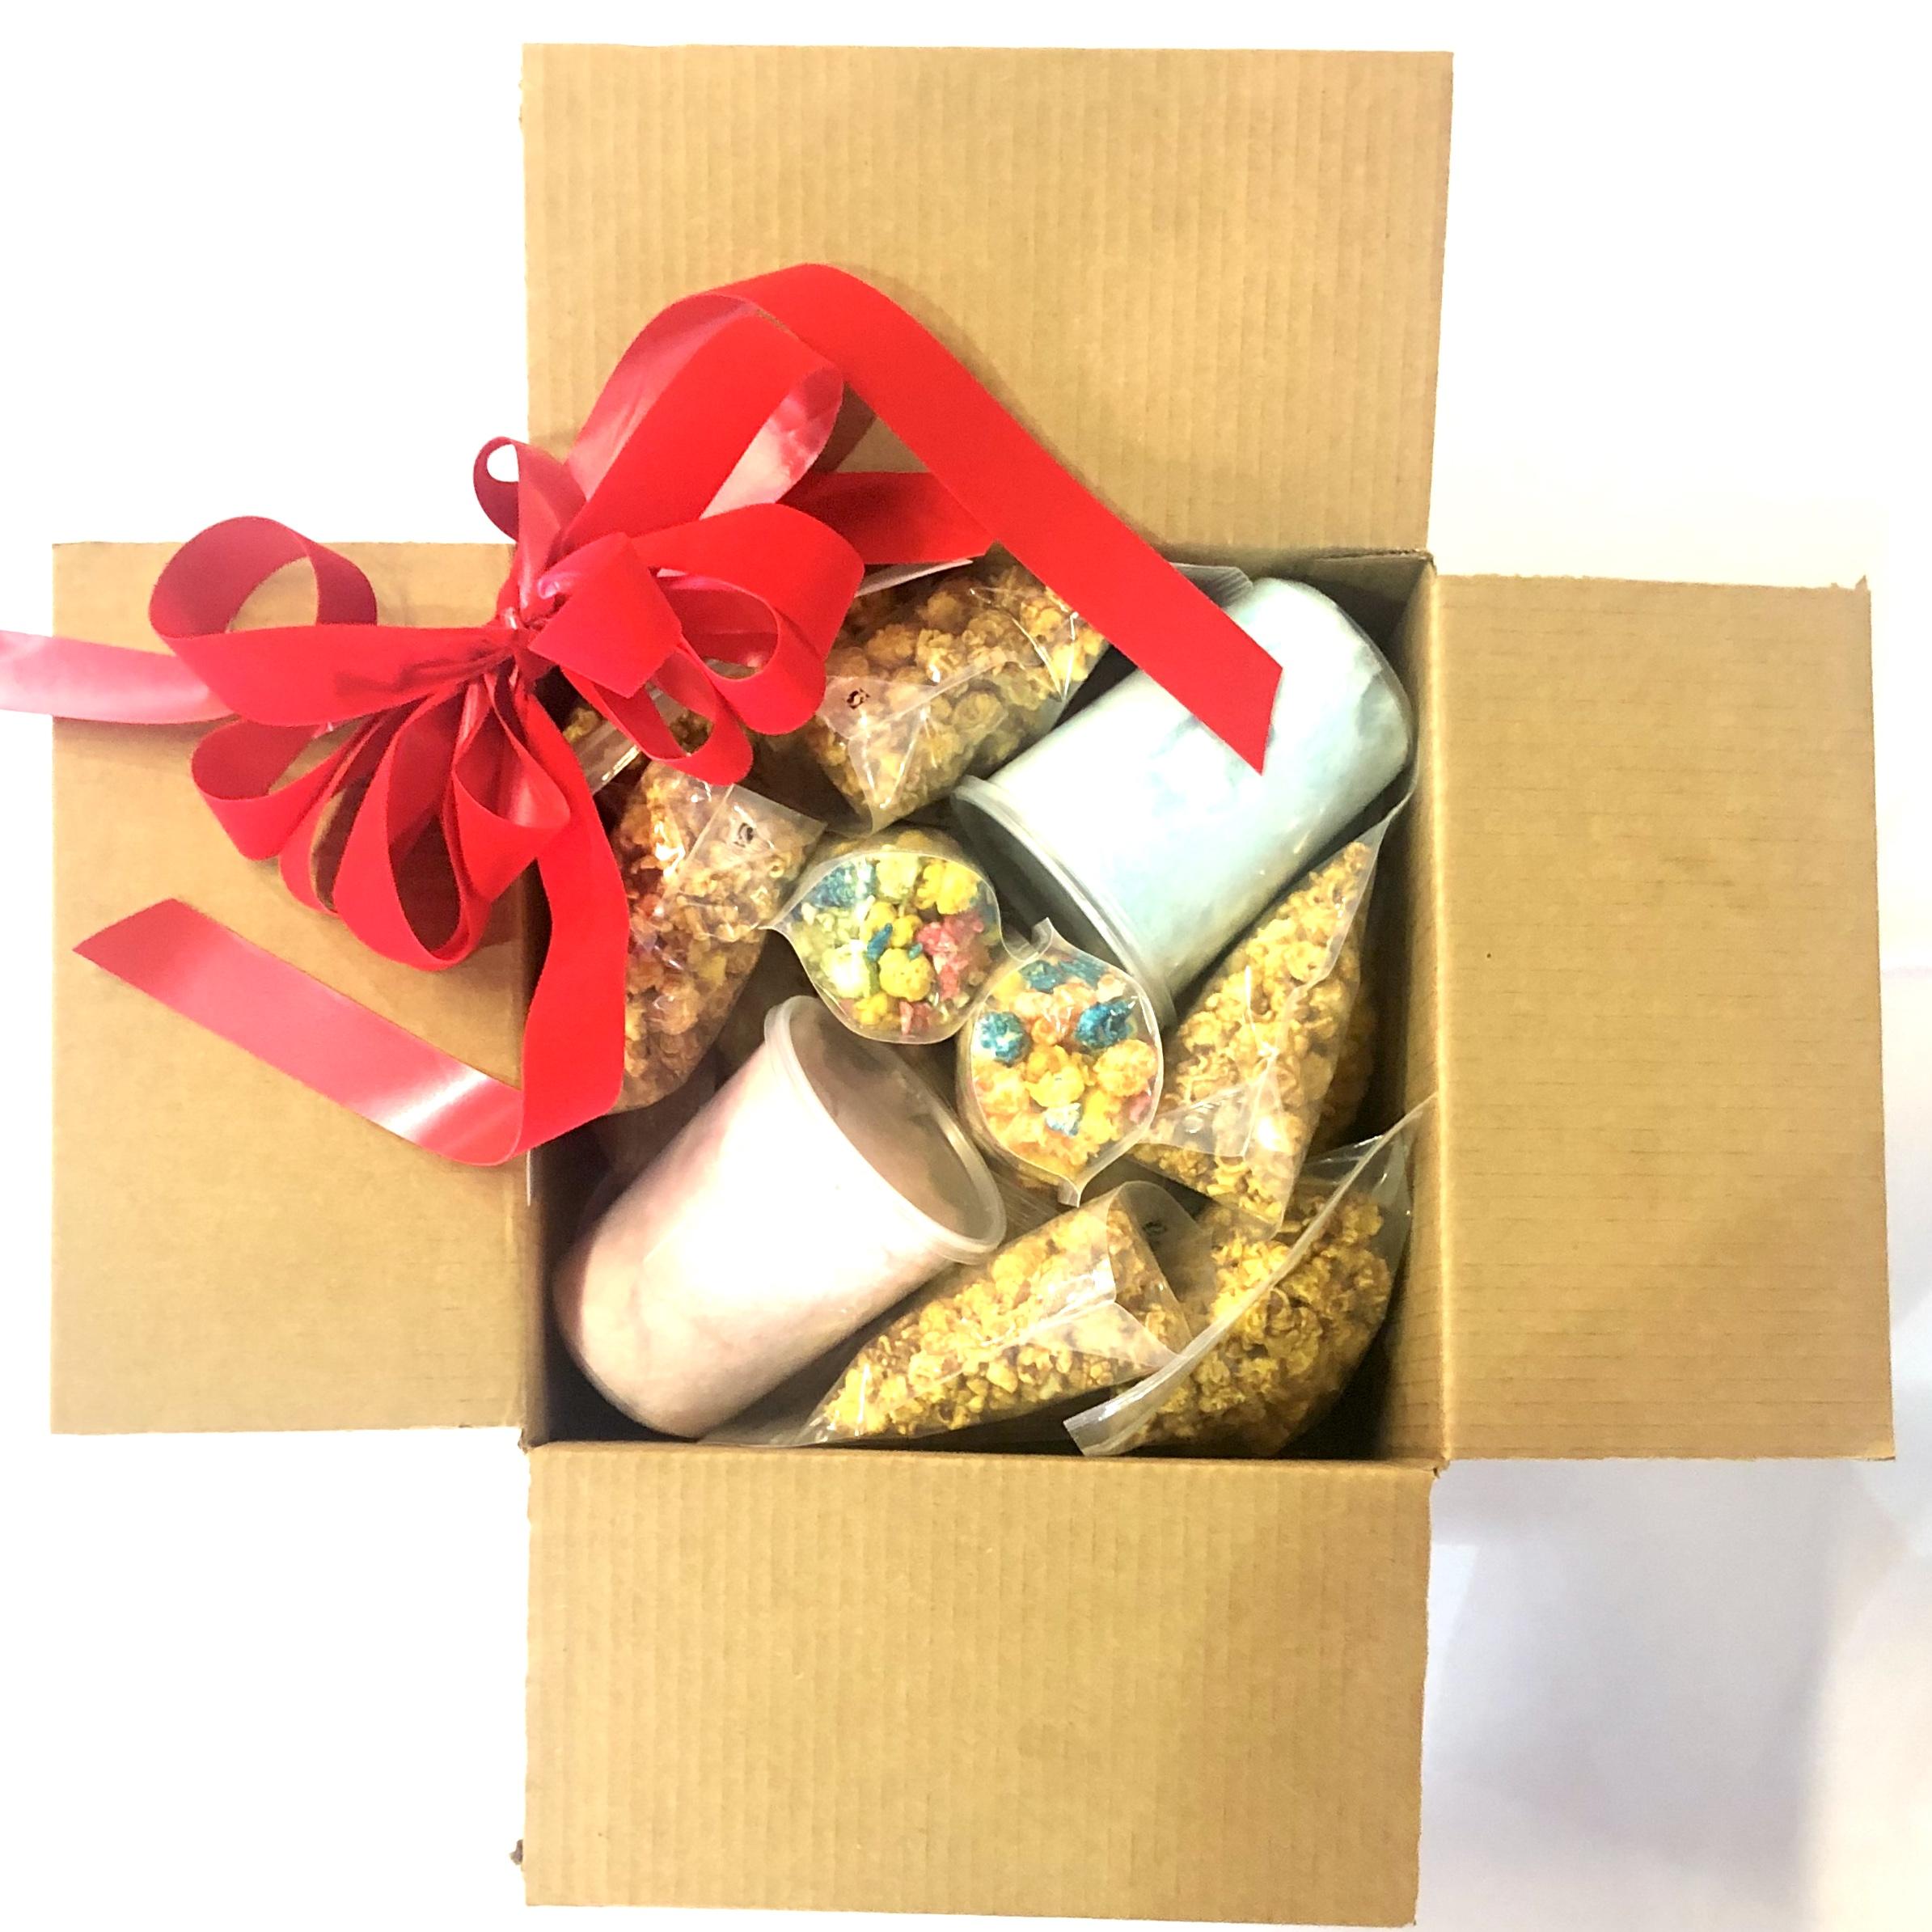 *NEW* PRE-ORDER Employee Celebration Gift Boxes